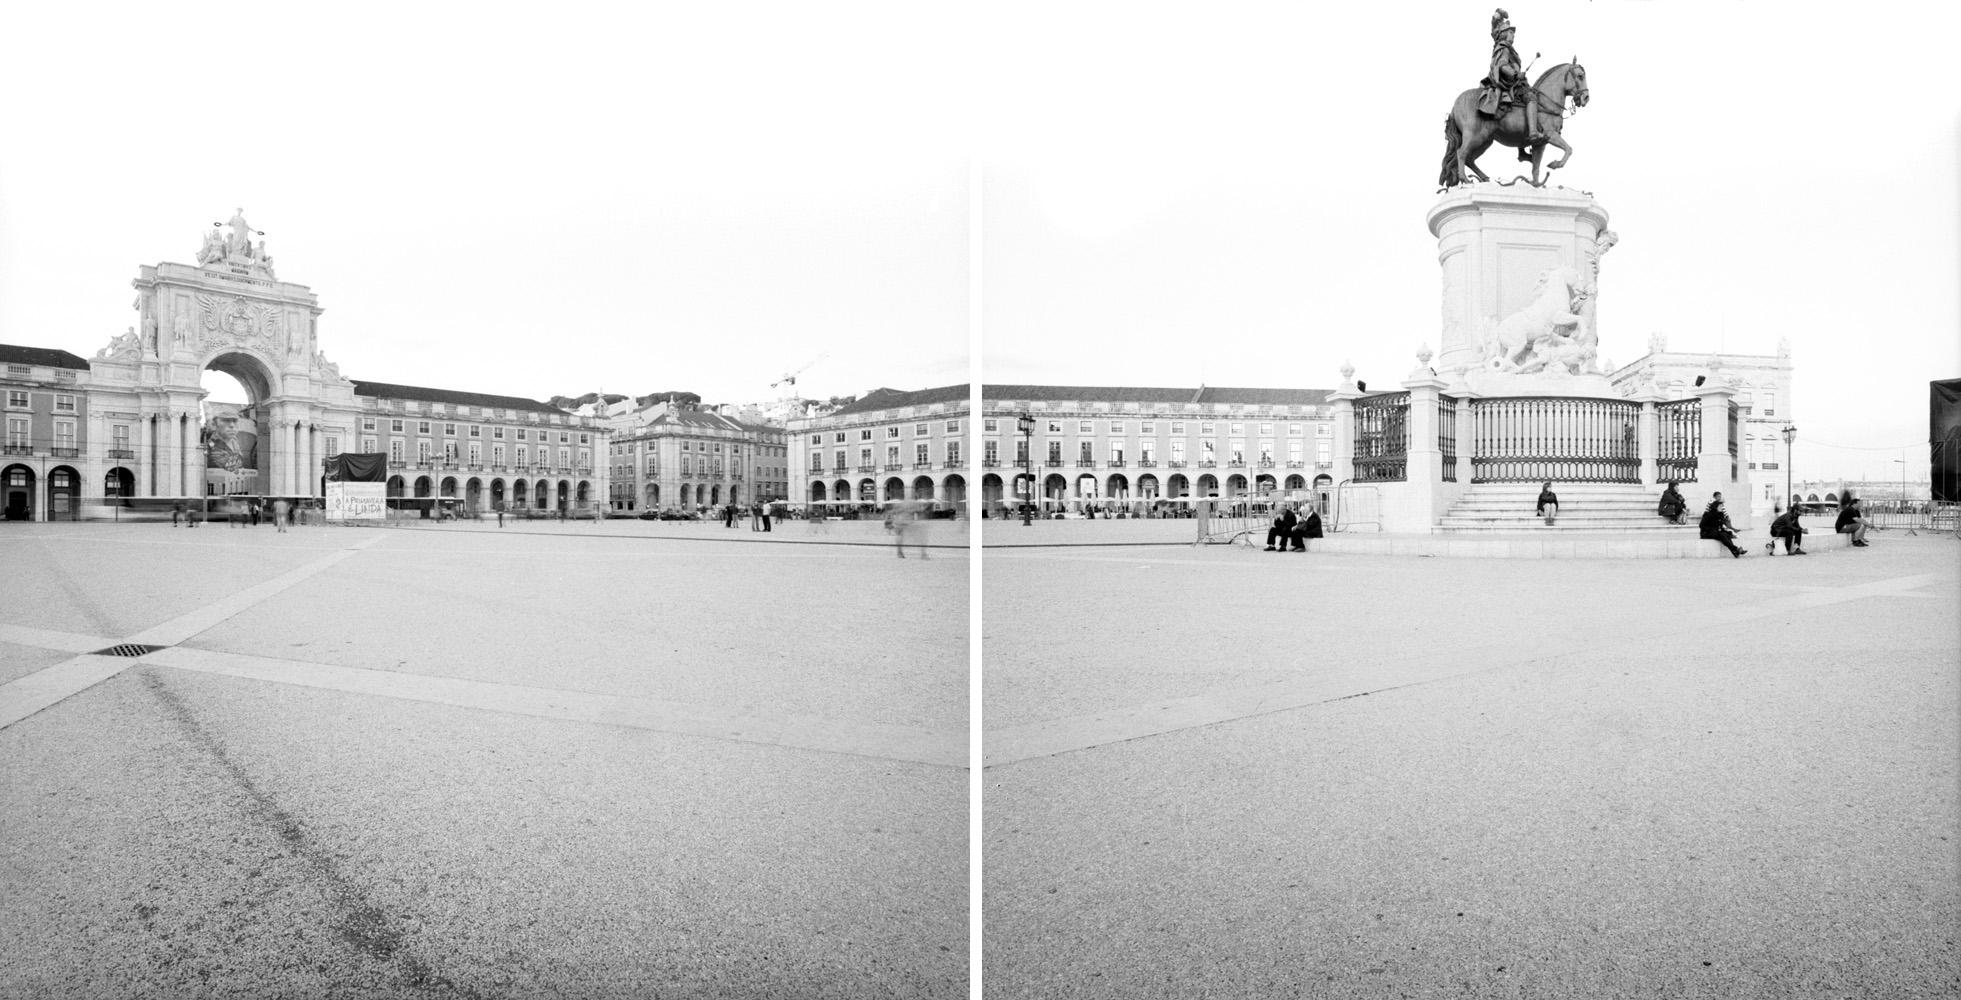 TriX-Lisbon-WalkingAround7 7pano.jpg